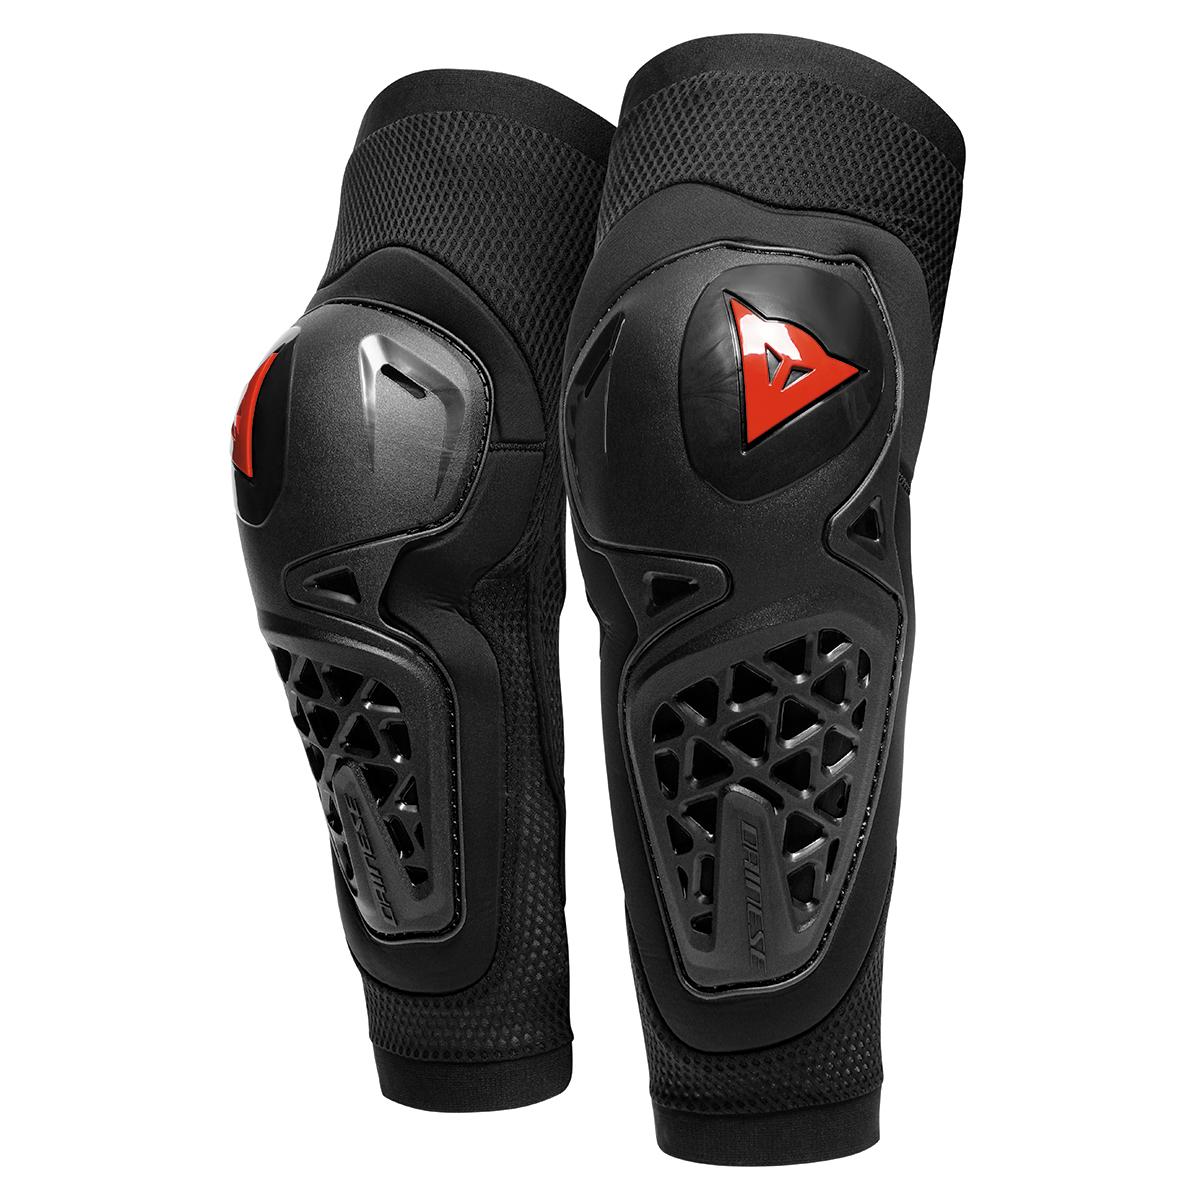 Dainese MX 1 Elbow Guard Black L